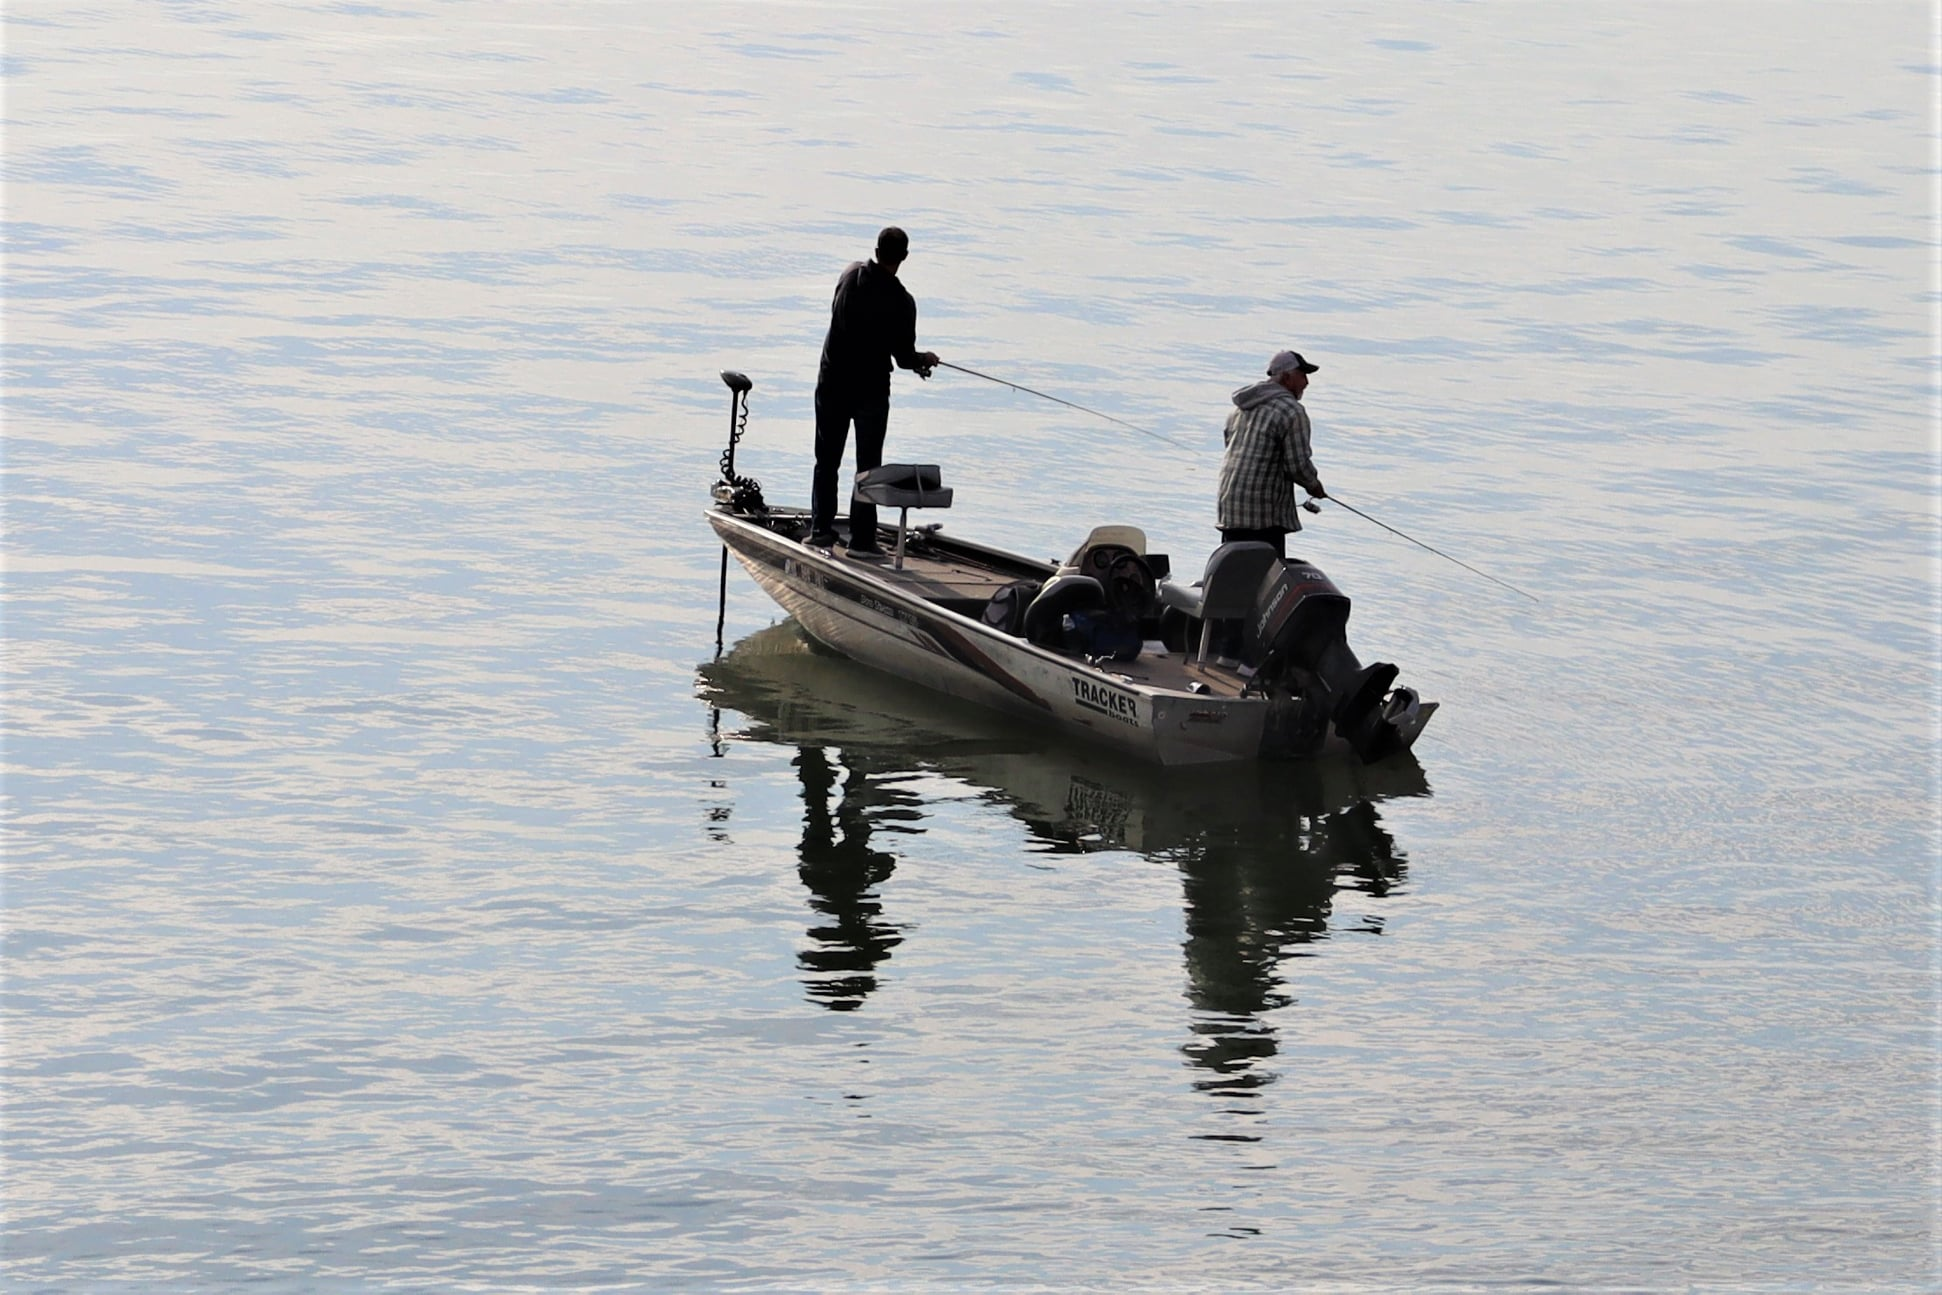 Fishing on Harlan County Reservoir